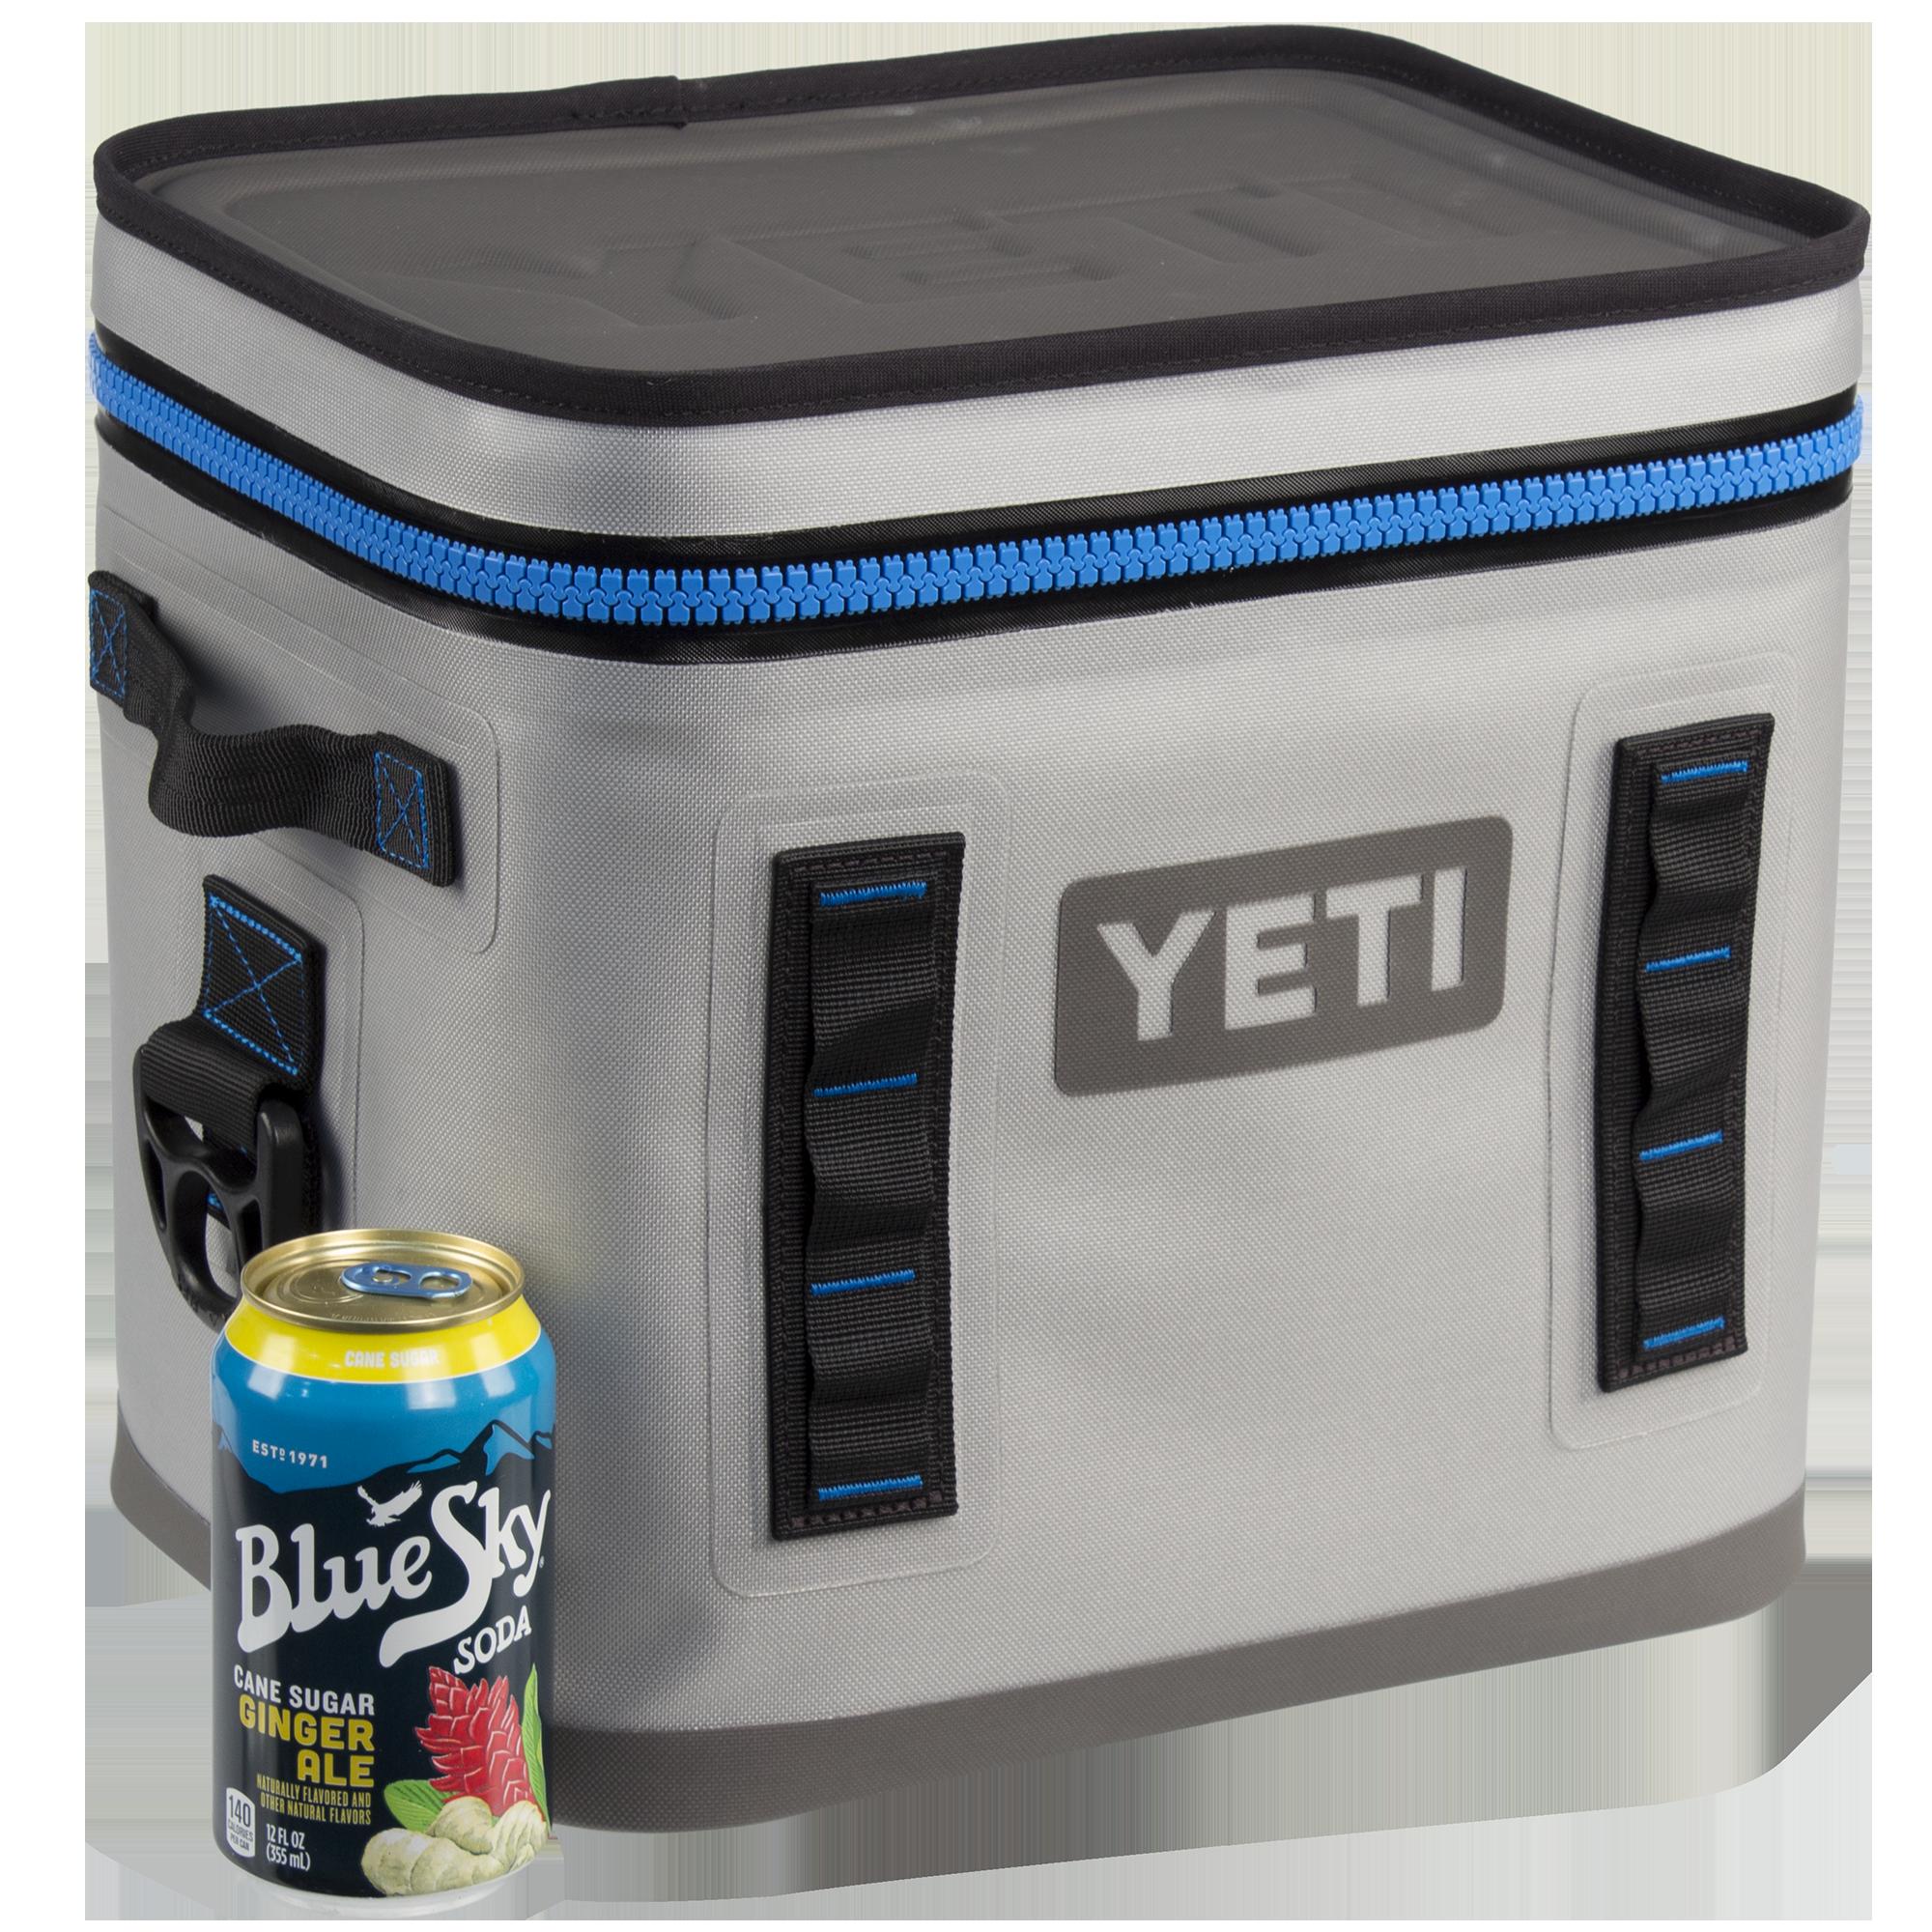 Yeti Flip 12 Cooler